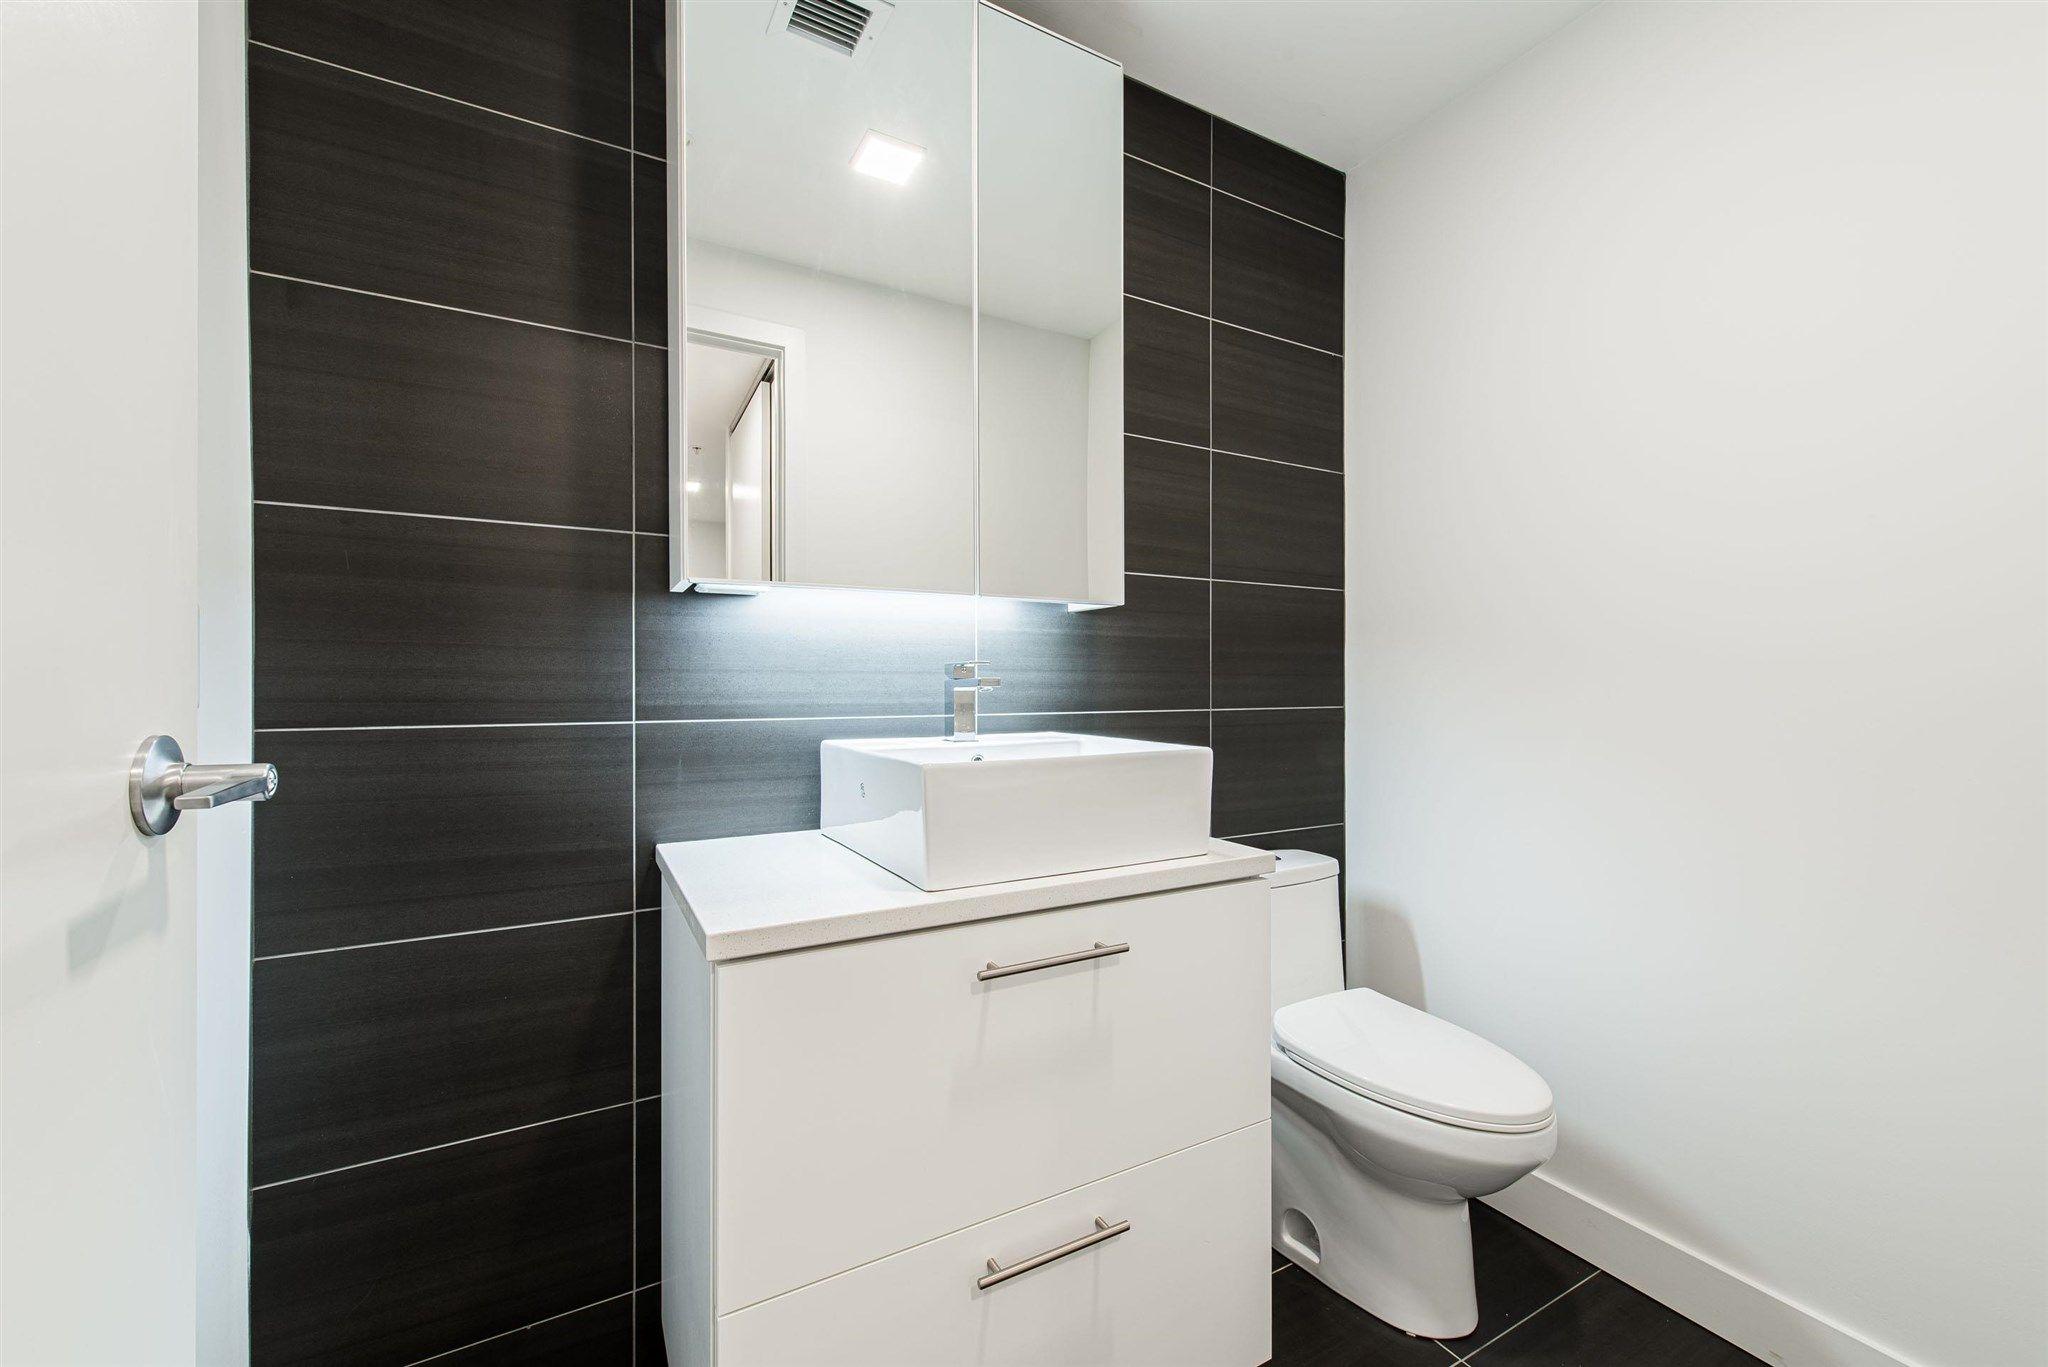 Photo 18: Photos: 105 1048 Wellington Street in Halifax: 2-Halifax South Residential for sale (Halifax-Dartmouth)  : MLS®# 202100816